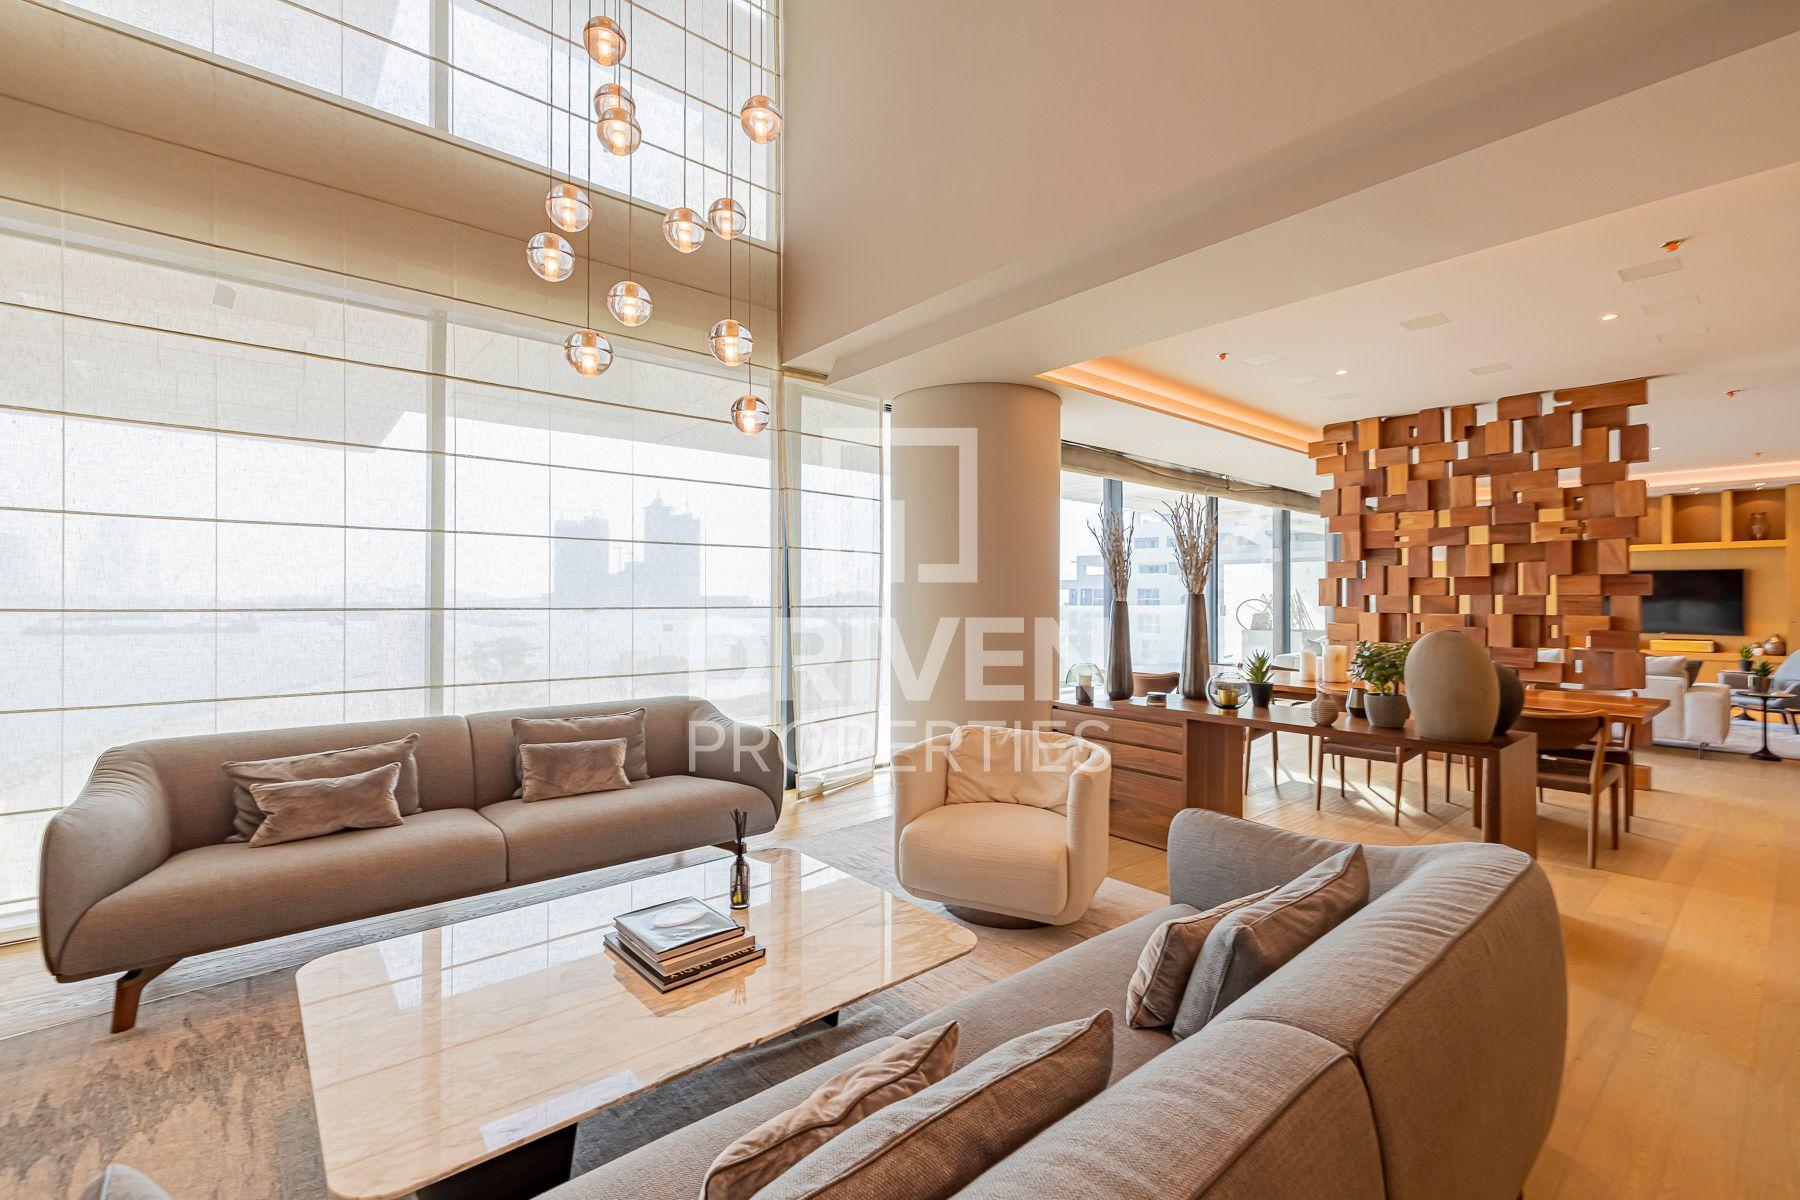 Super Potato Designed Stunning 4 Bedroom